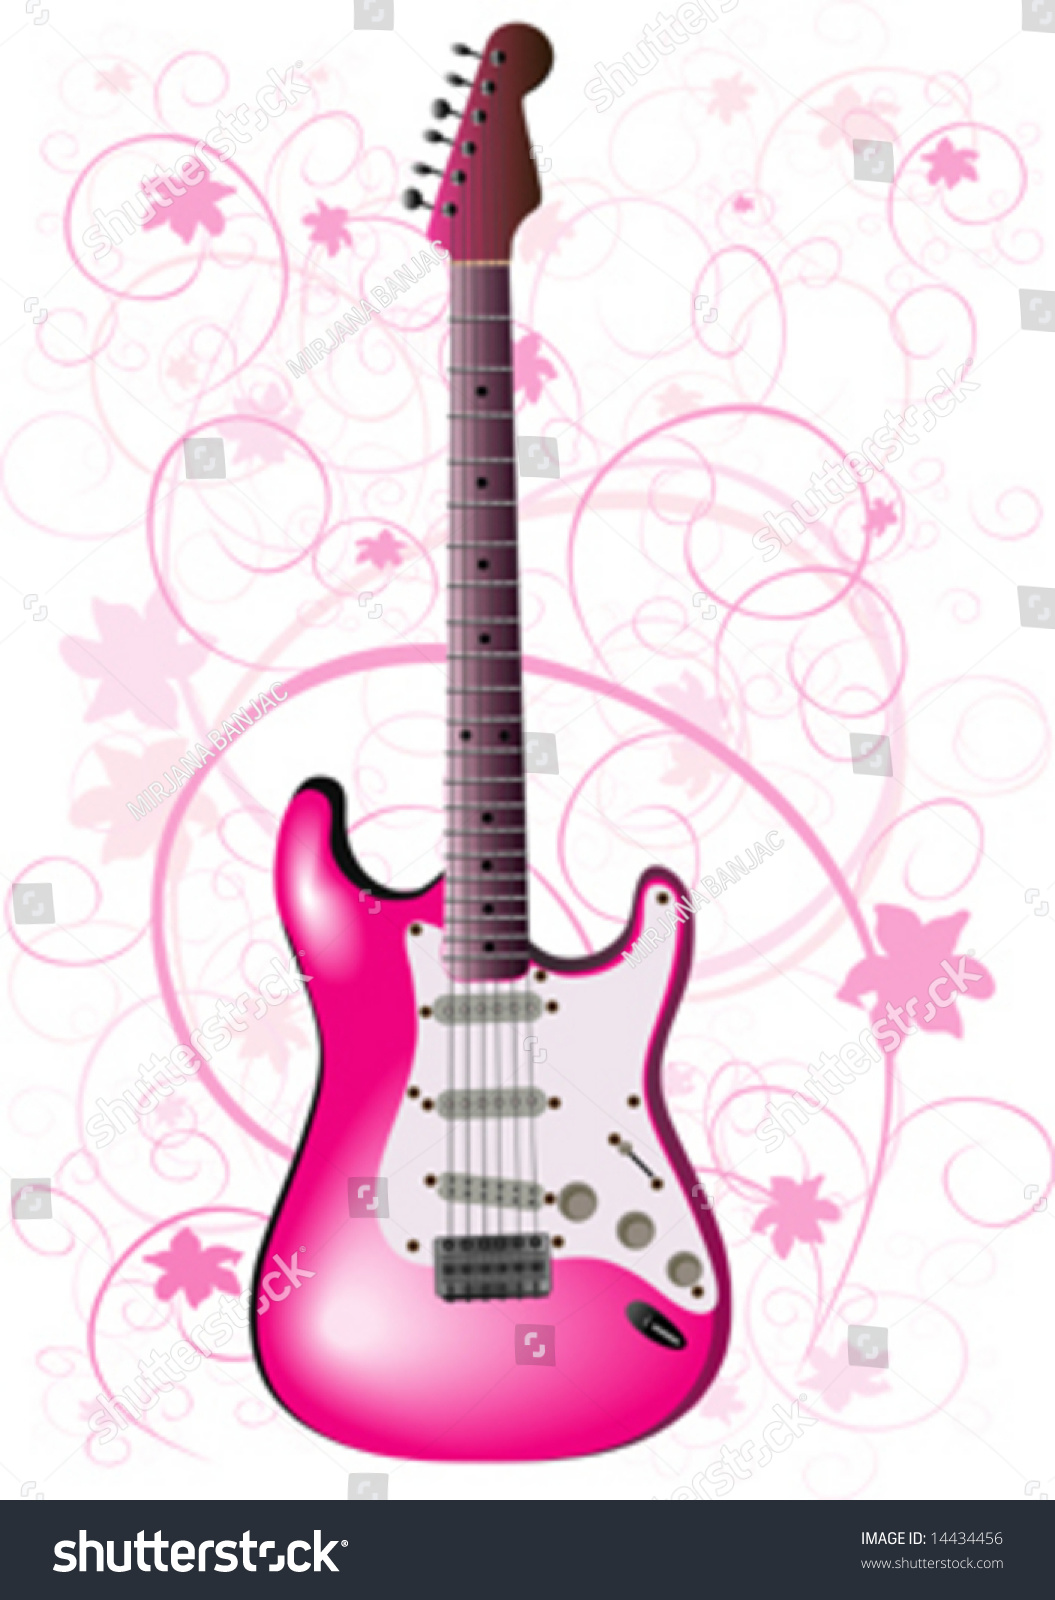 wallpaper music guitar pink - photo #16